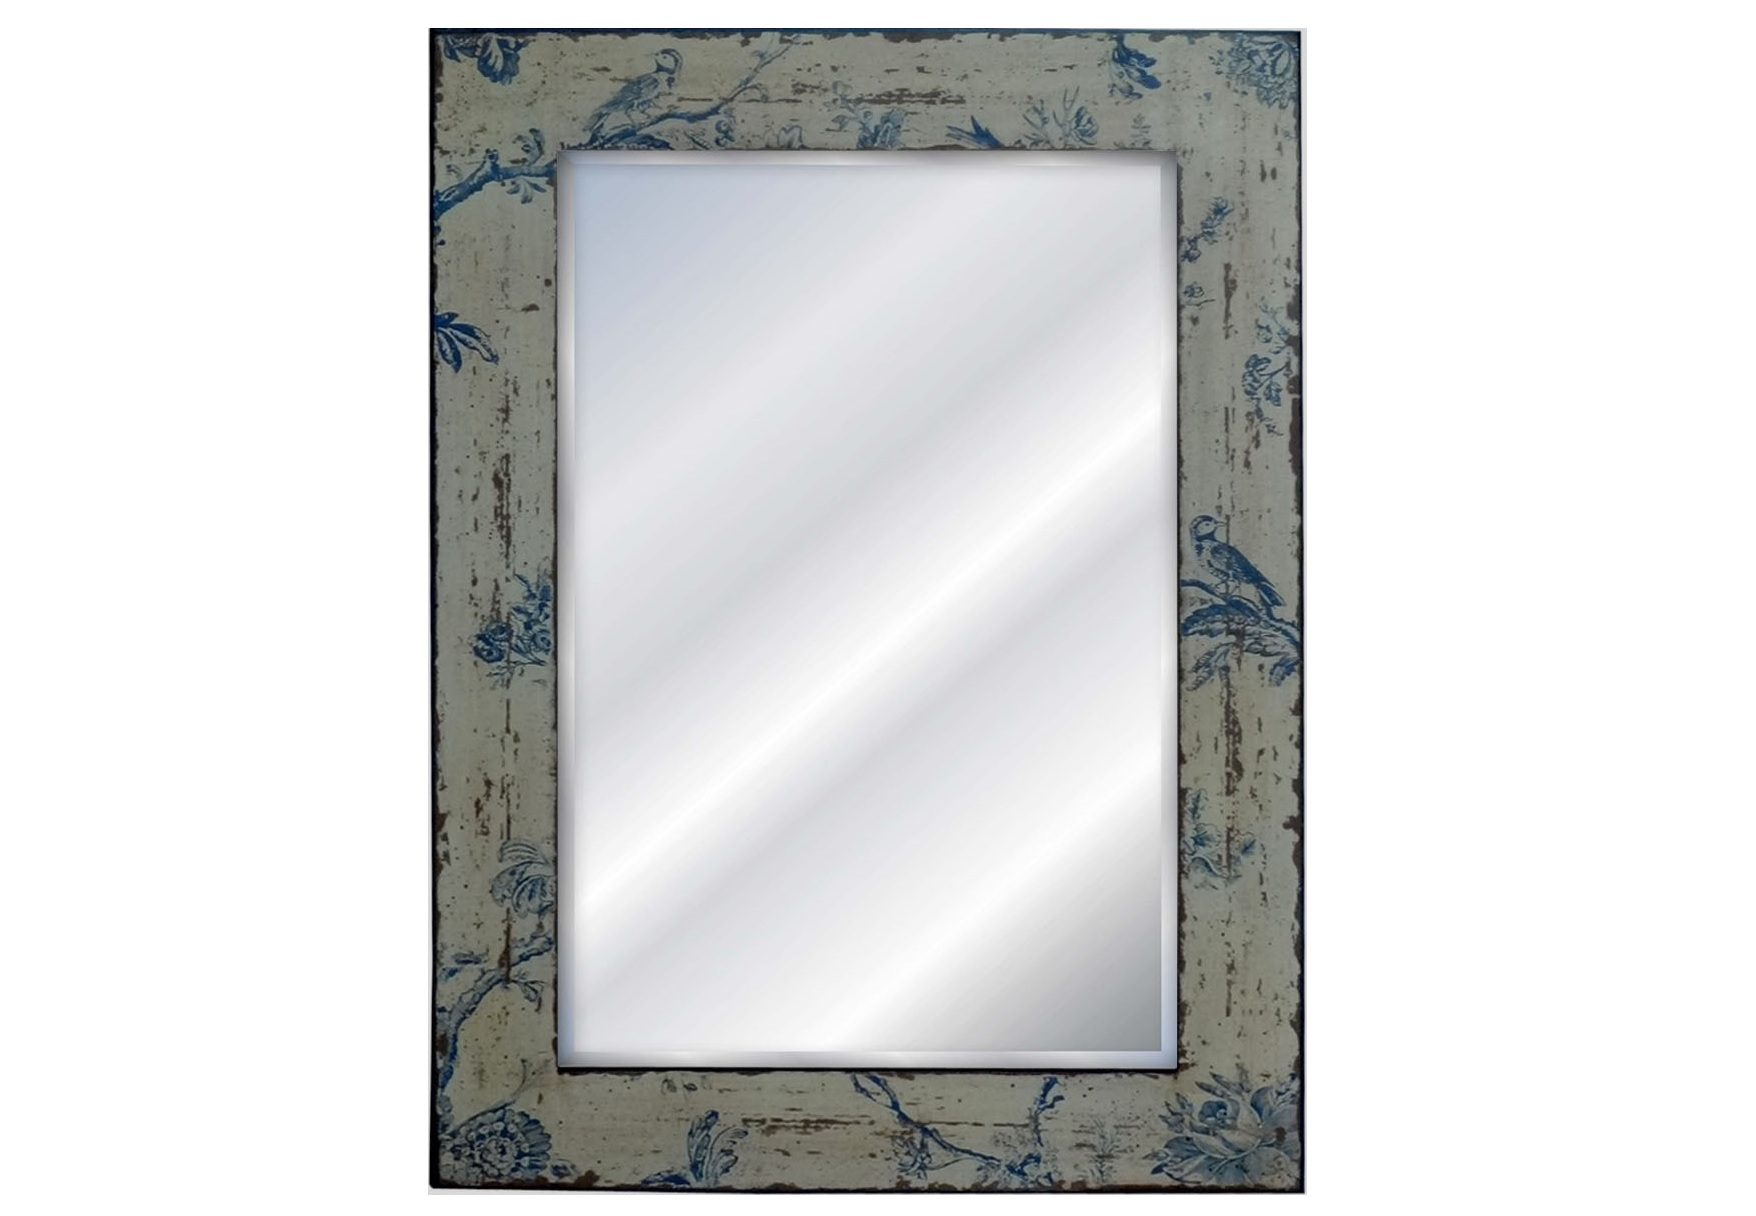 Зеркало настенноеНастенные зеркала<br><br><br>Material: Дерево<br>Width см: 84<br>Depth см: 6<br>Height см: 114